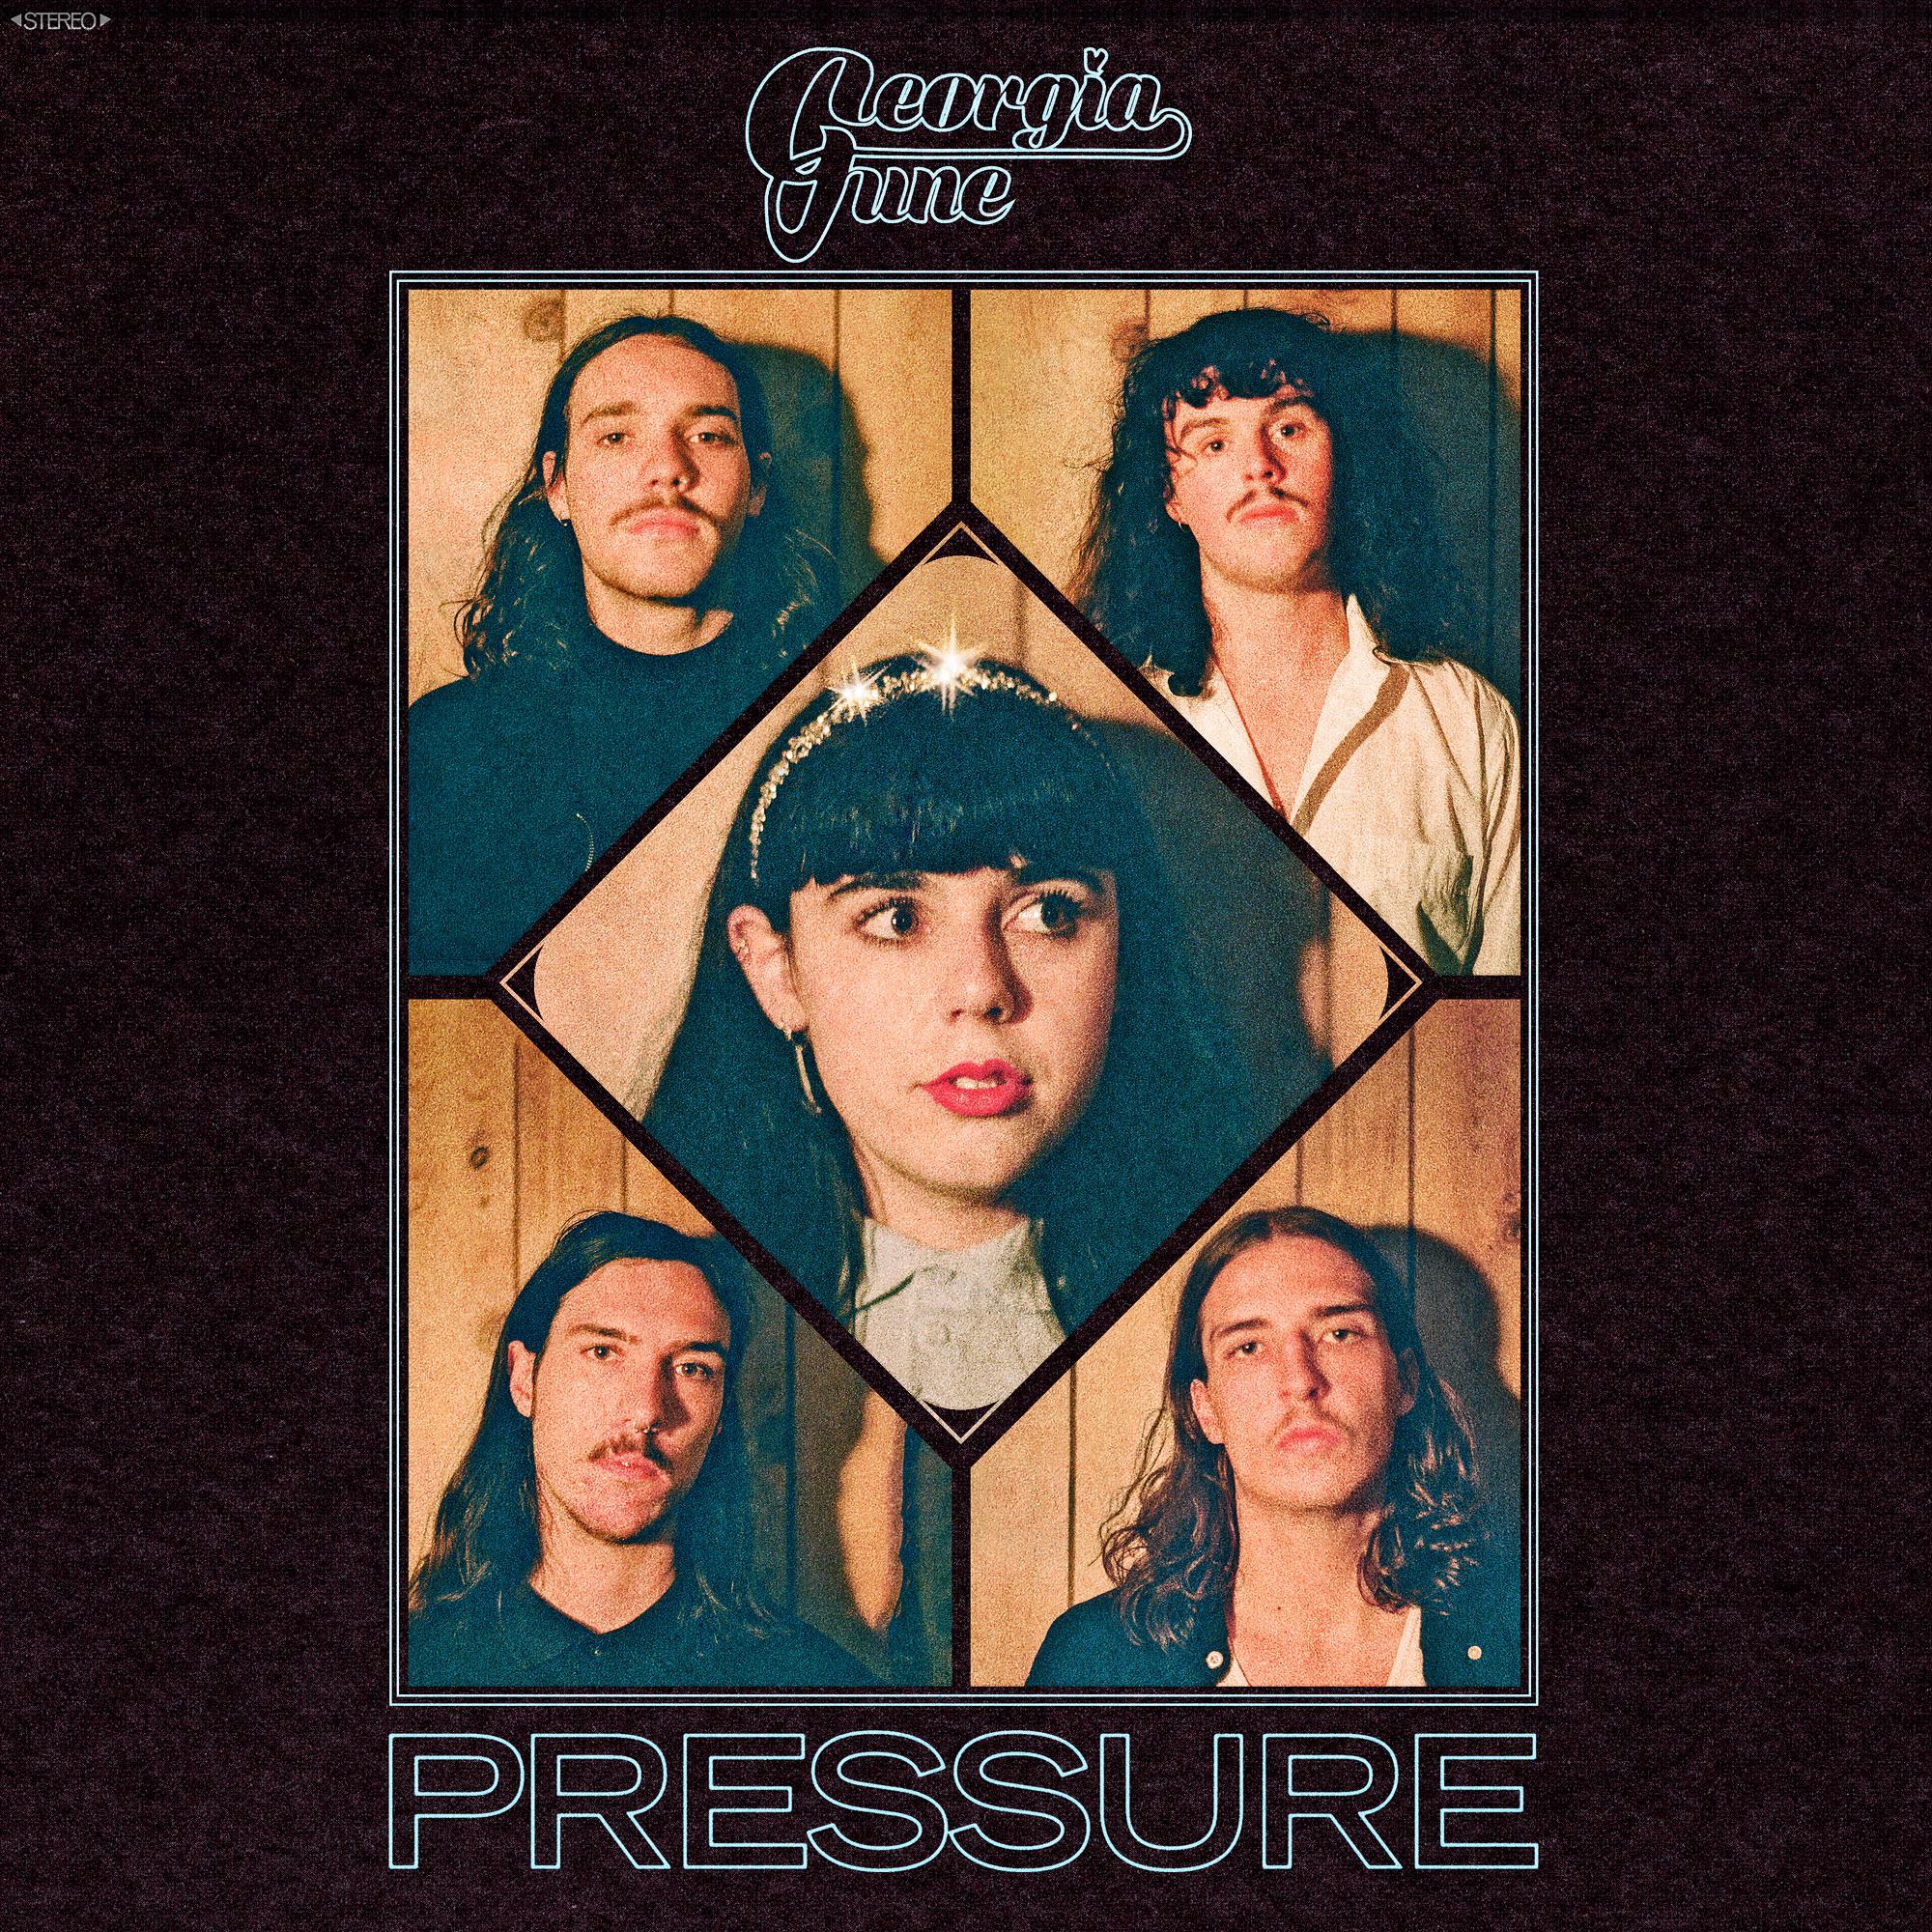 Georgia June Pressure